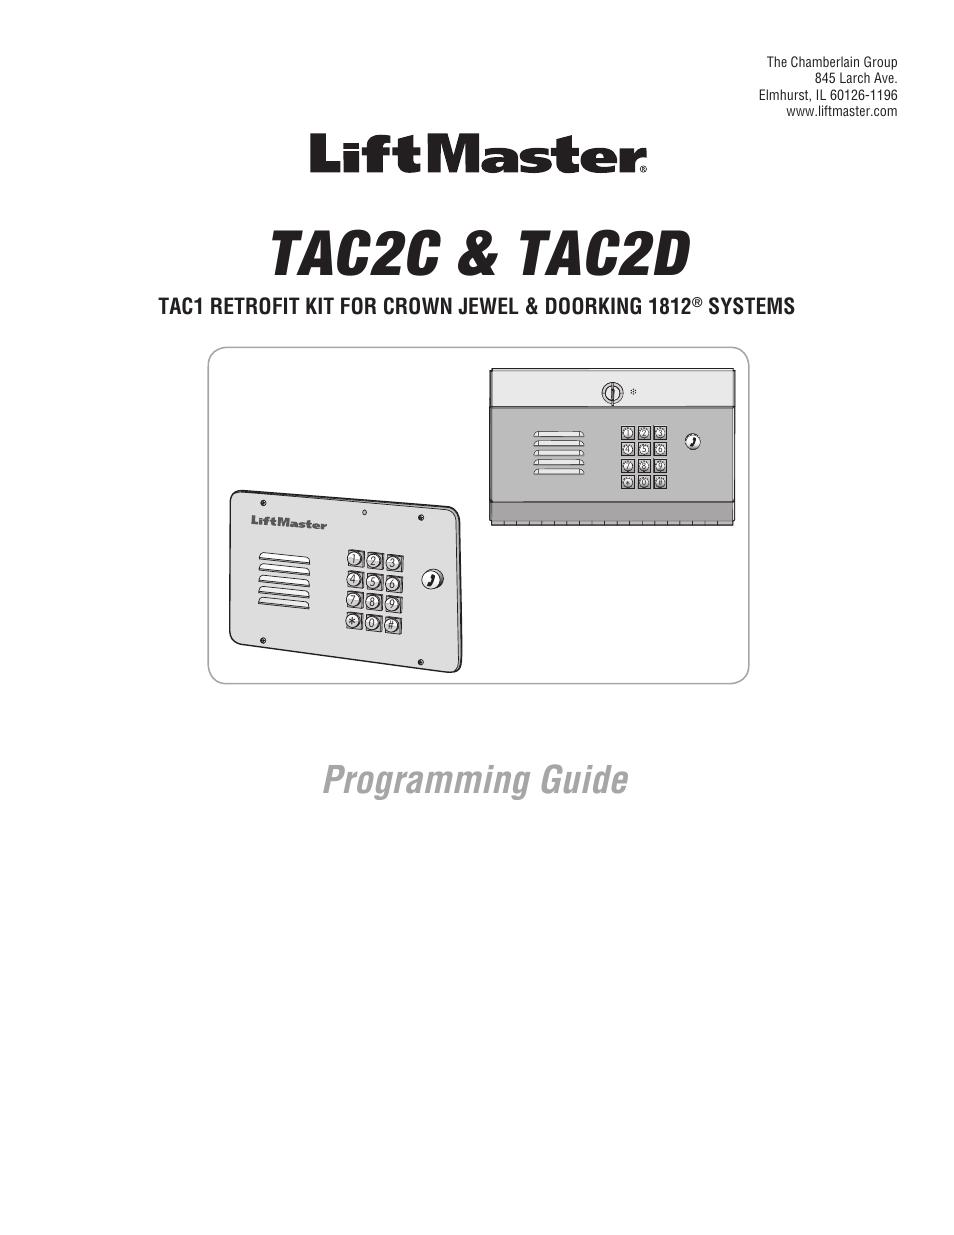 LiftMaster TAC2D TAC Retrofit System for *1812 User Manual